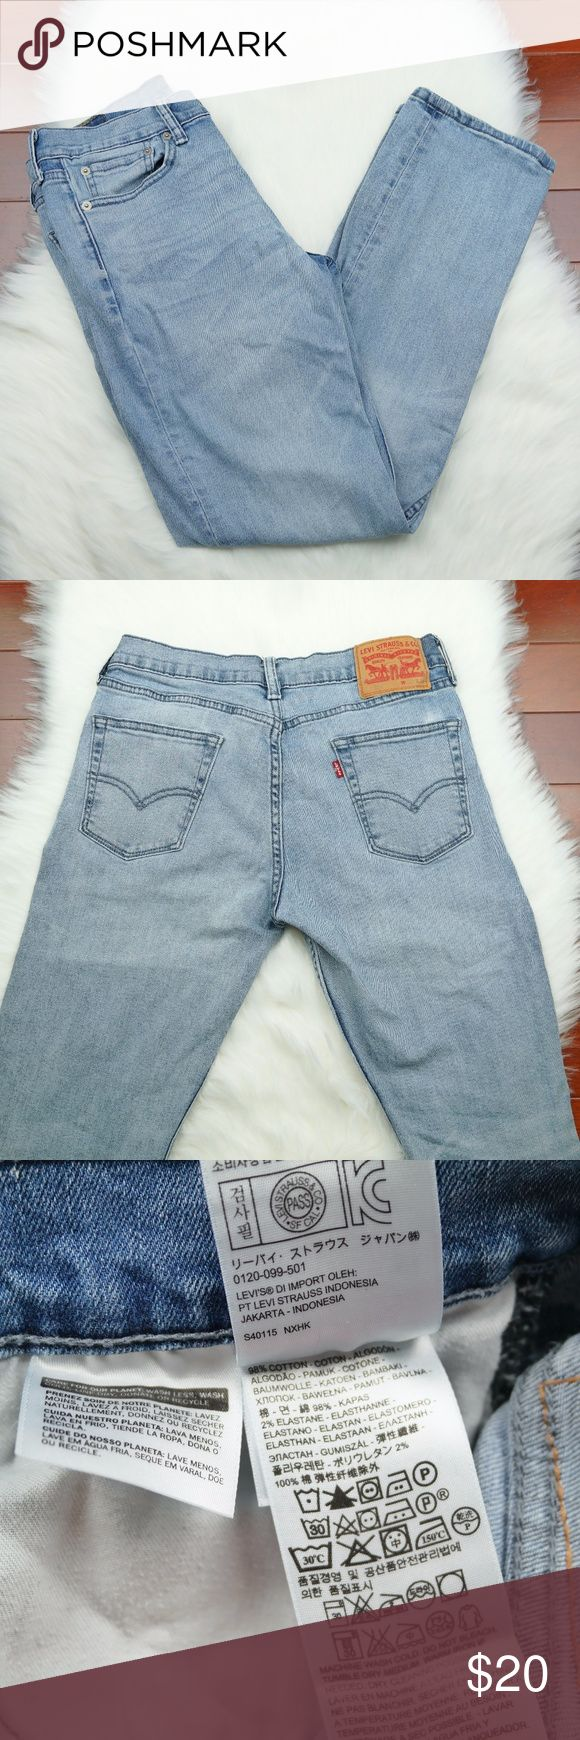 "VINTAGE MEN'S JEANS FADED BLUE LEVI STRAUSS & CO Levi Strauss & Co  Inseam: 30""  Waist: 30"" (15"" across back)  Rise: 7""  Leg Opening: 7"" Levi's Jeans"